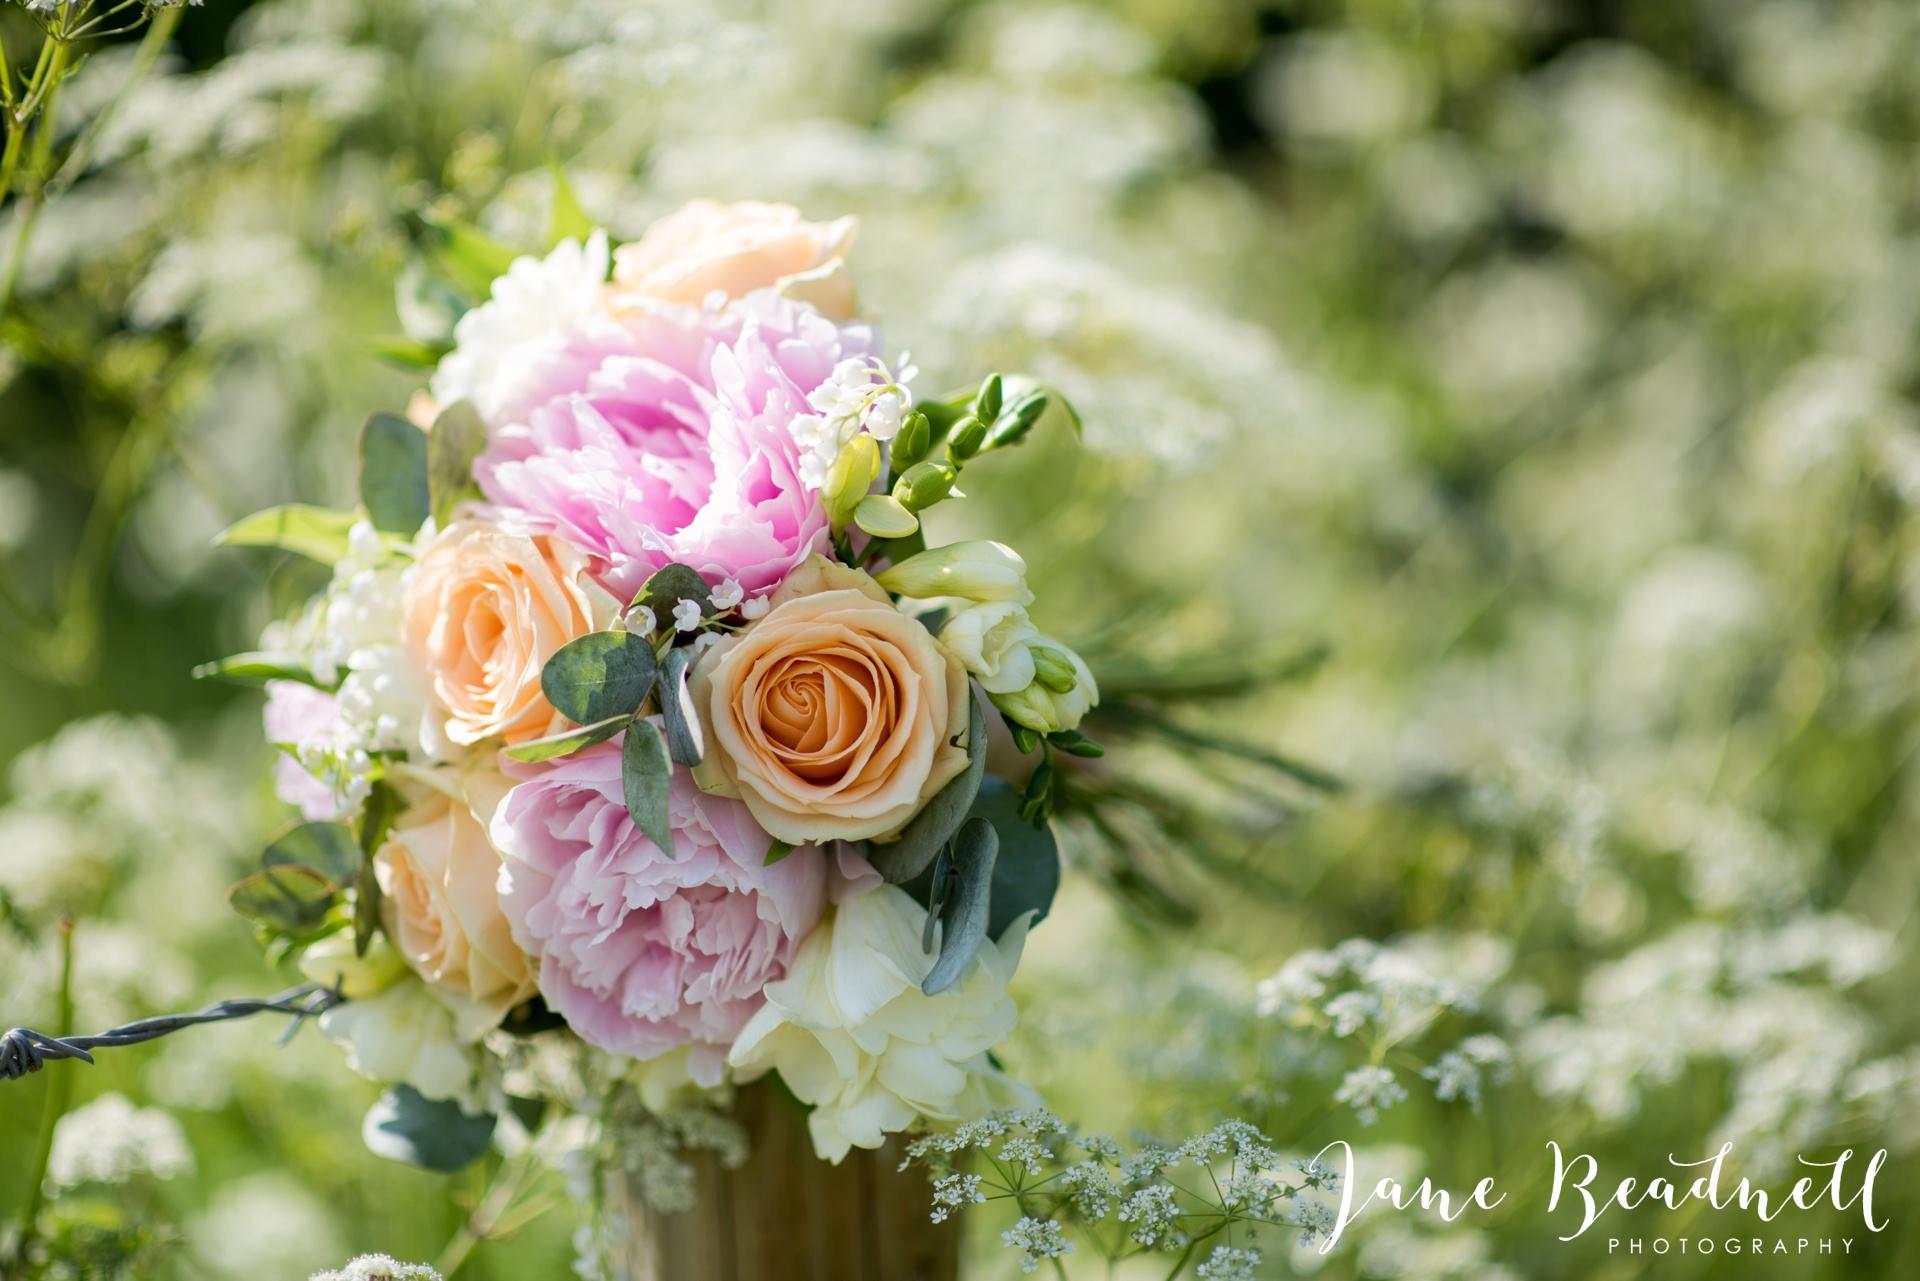 Bath Abbey wedding photography by fine art wedding photographer Leeds Jane Beadnell_38